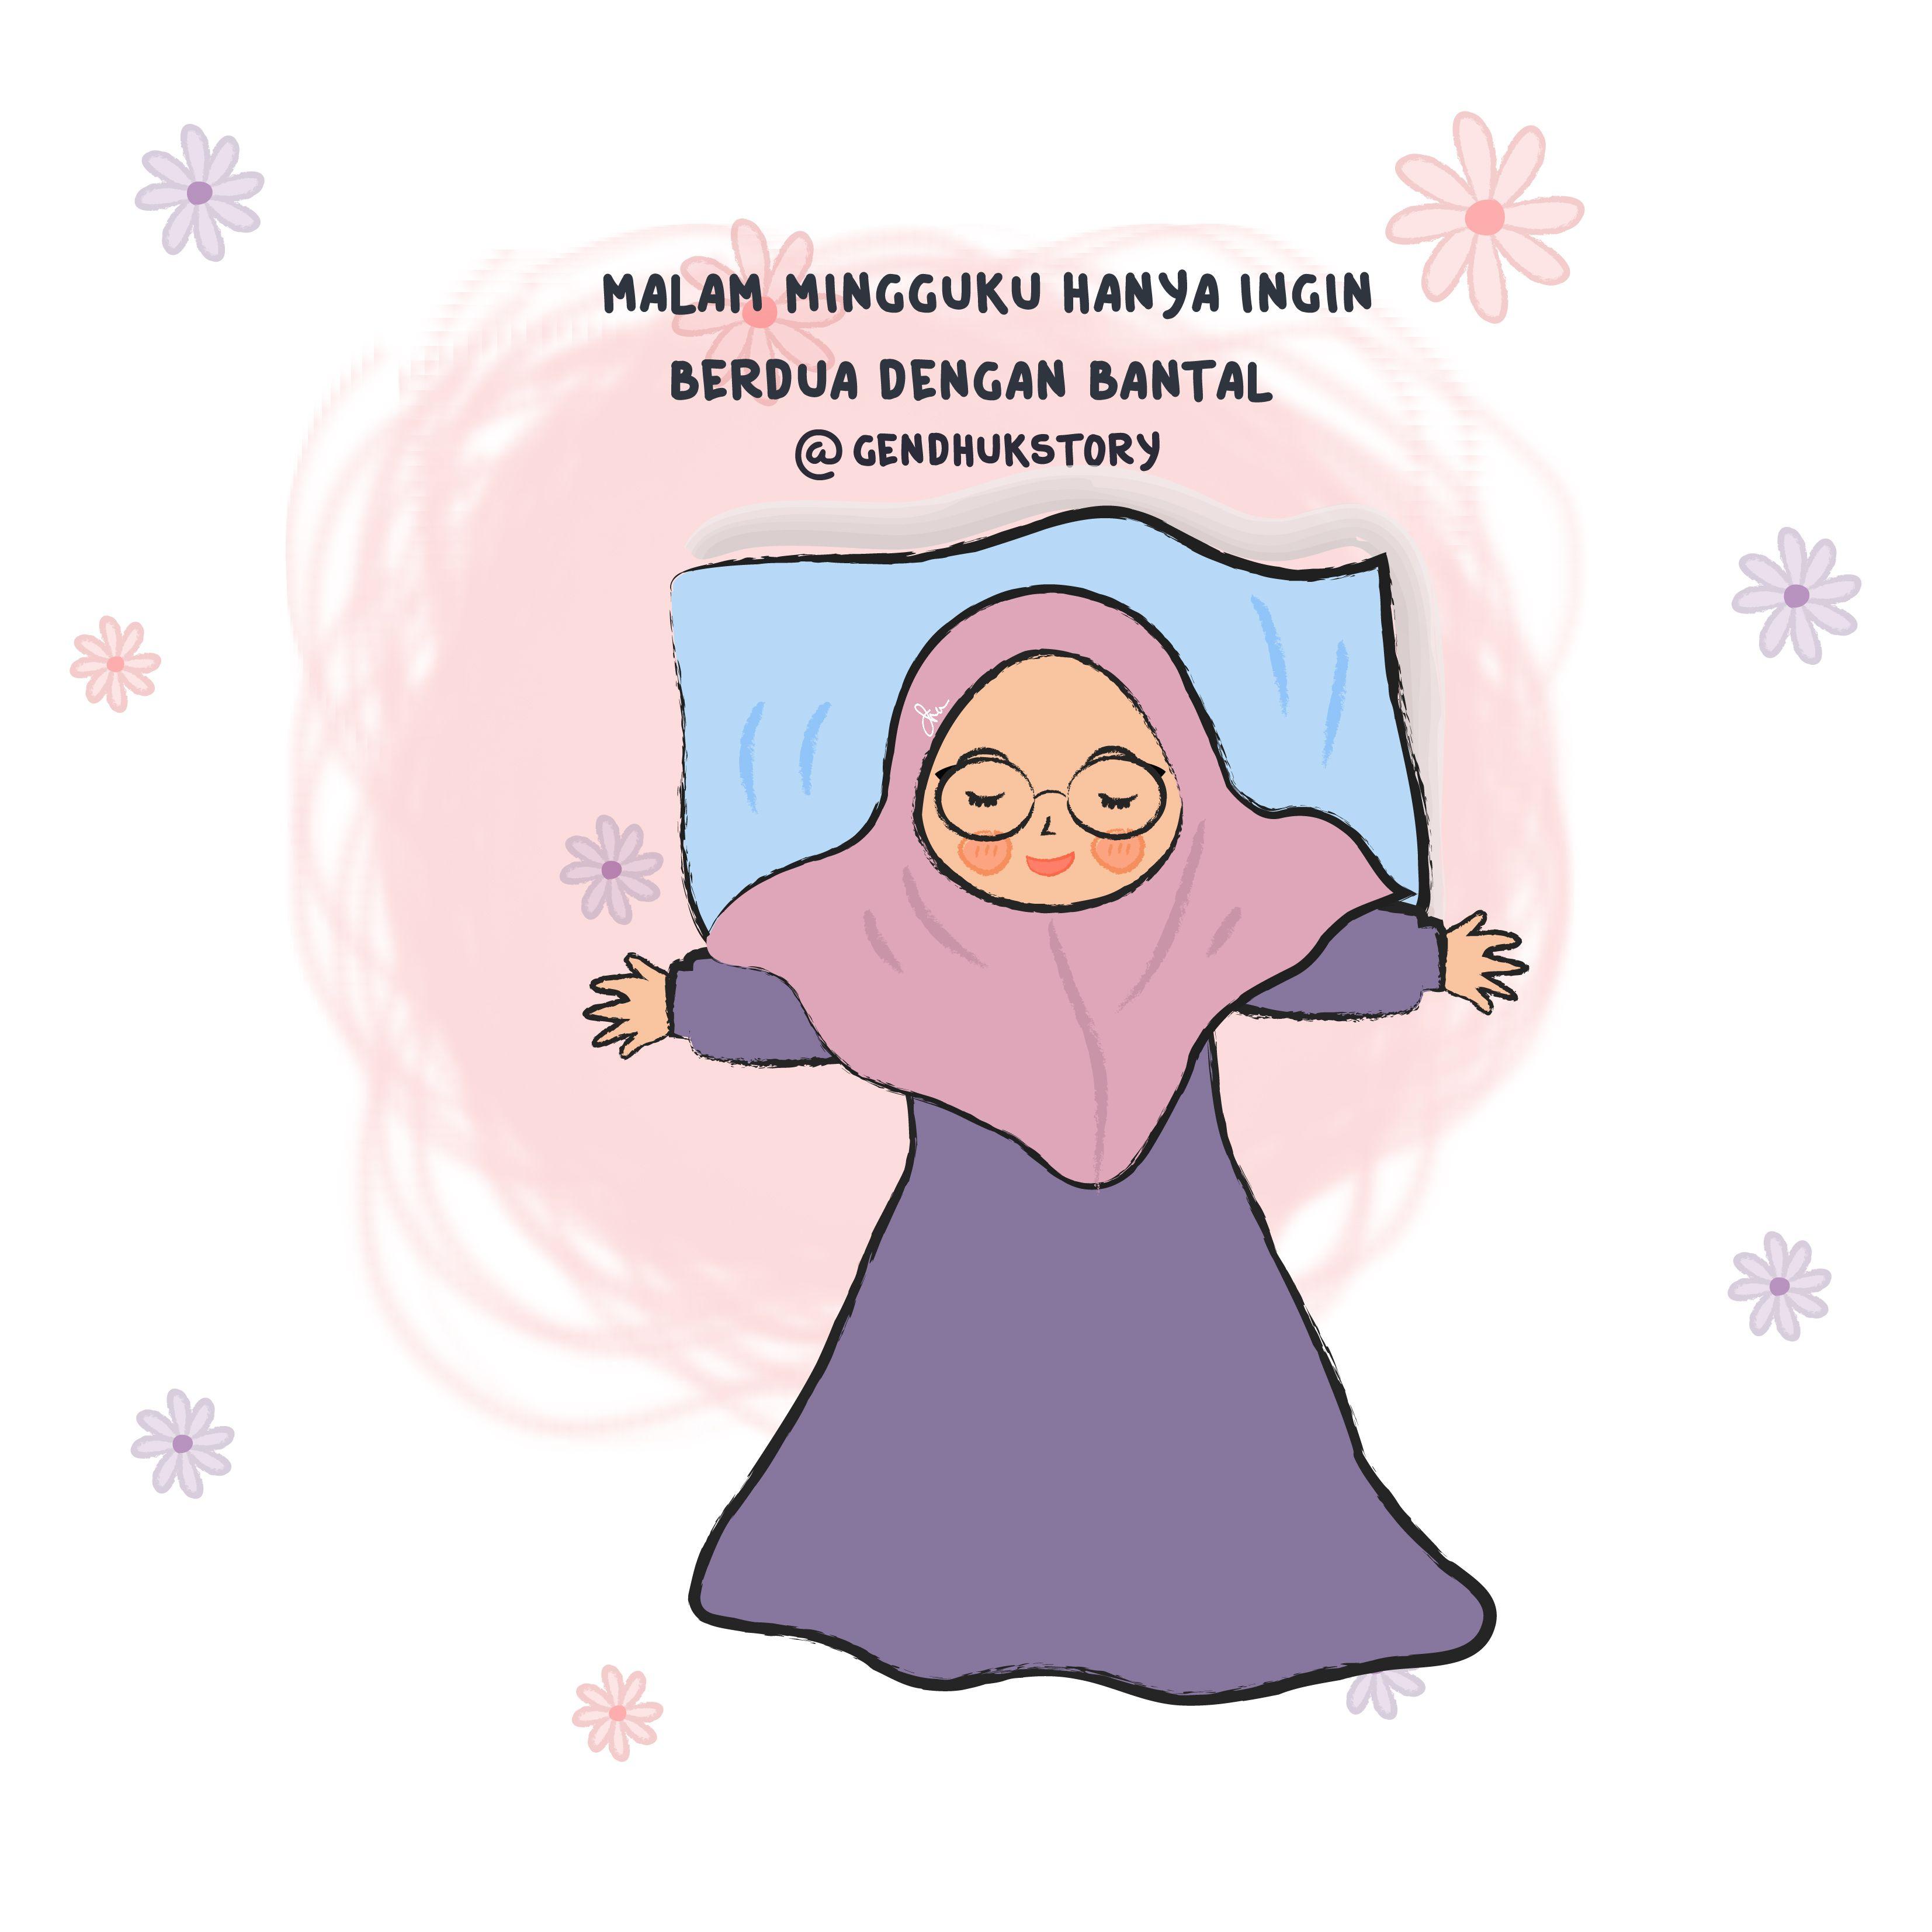 Pin By Dita Abidah On Muslimah Gendhukstory Pinterest Quotes